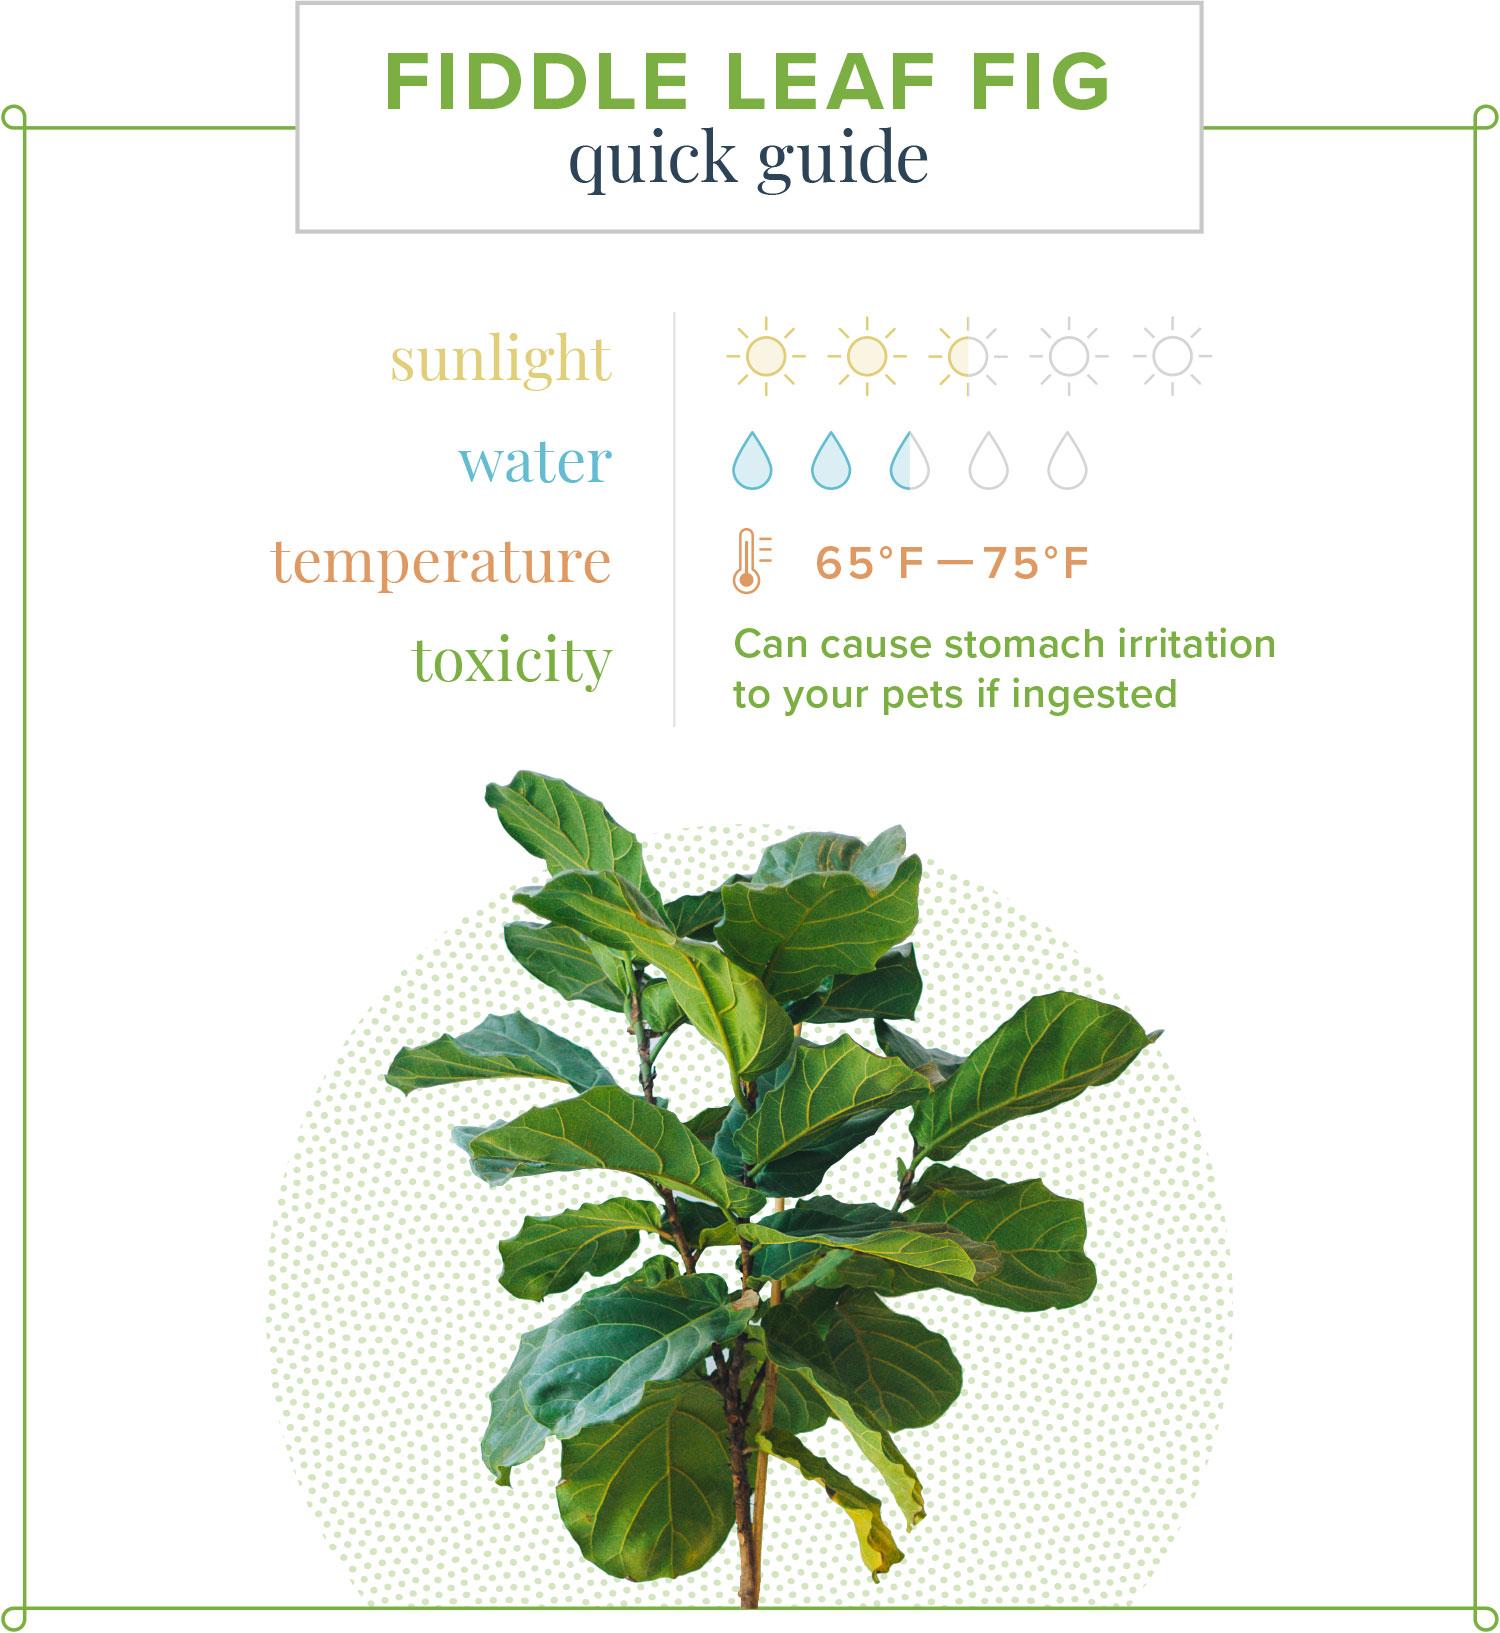 fiddle leaf fig quick care guide card